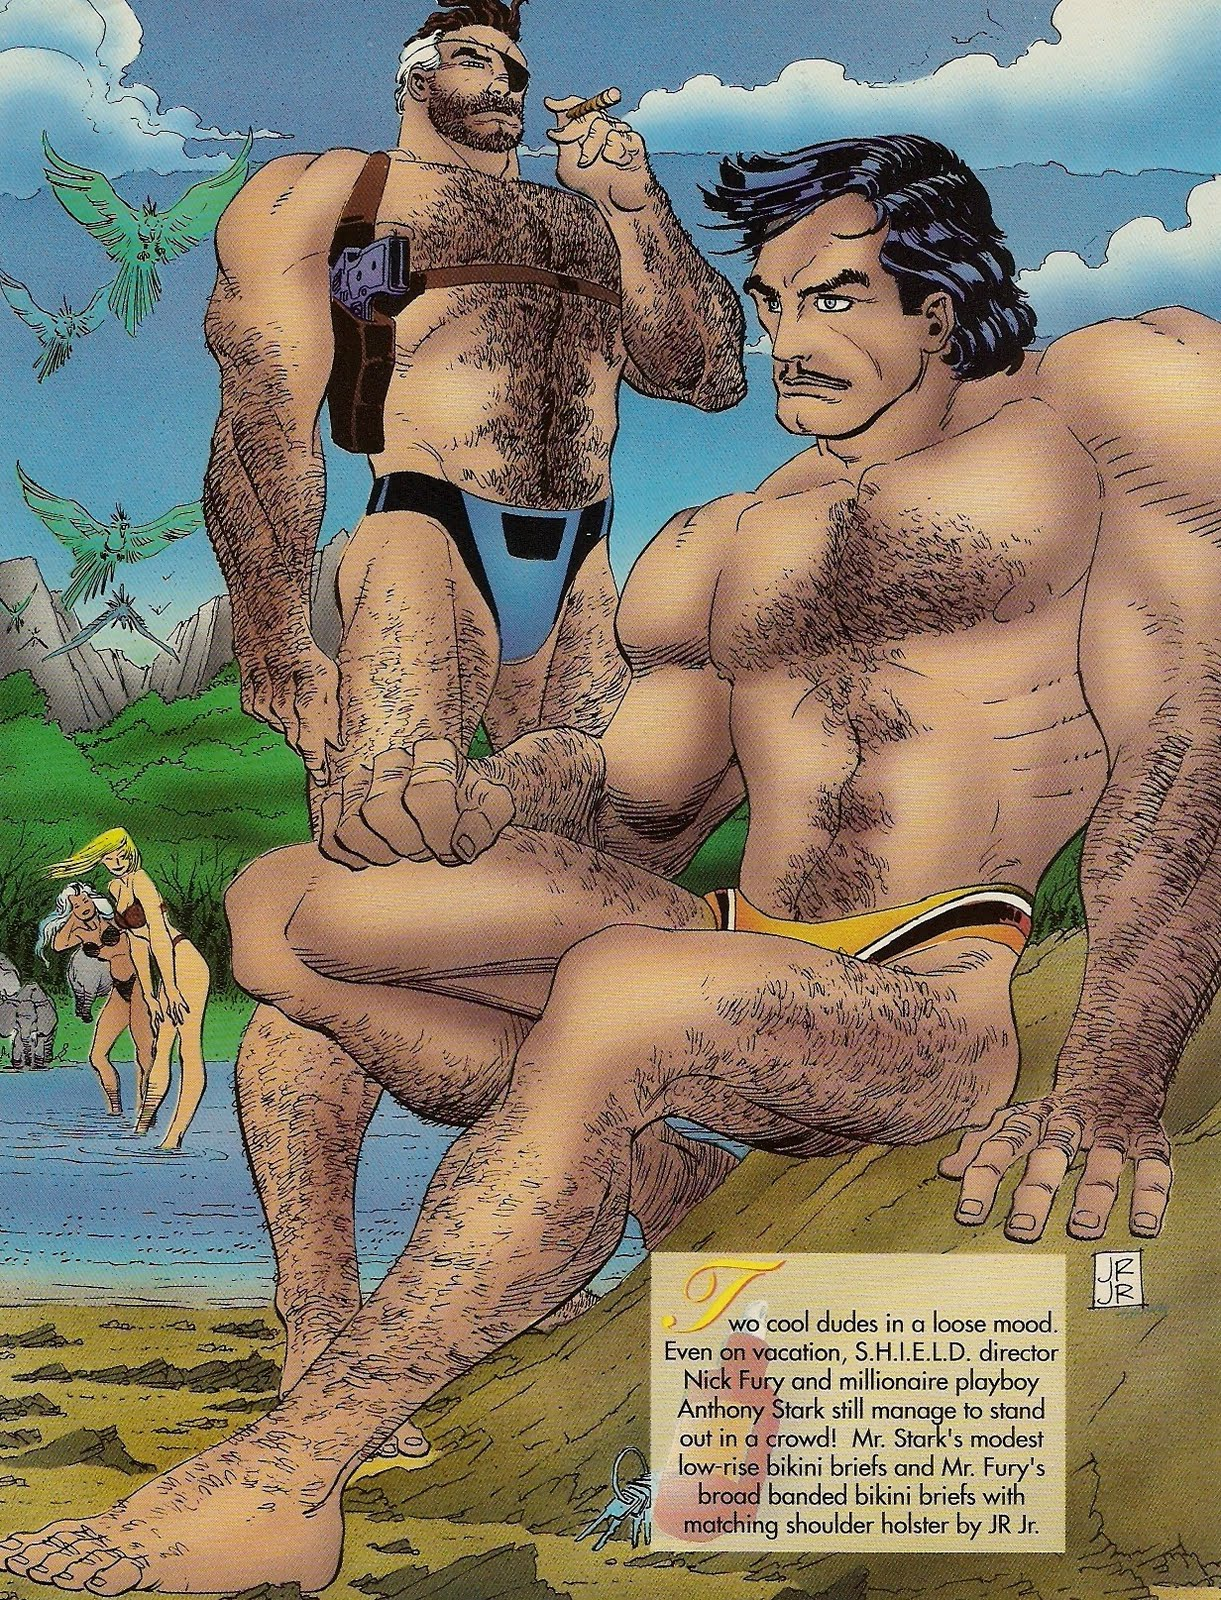 Guy Cartoons Homosexuell Pop kostenlose Bilder